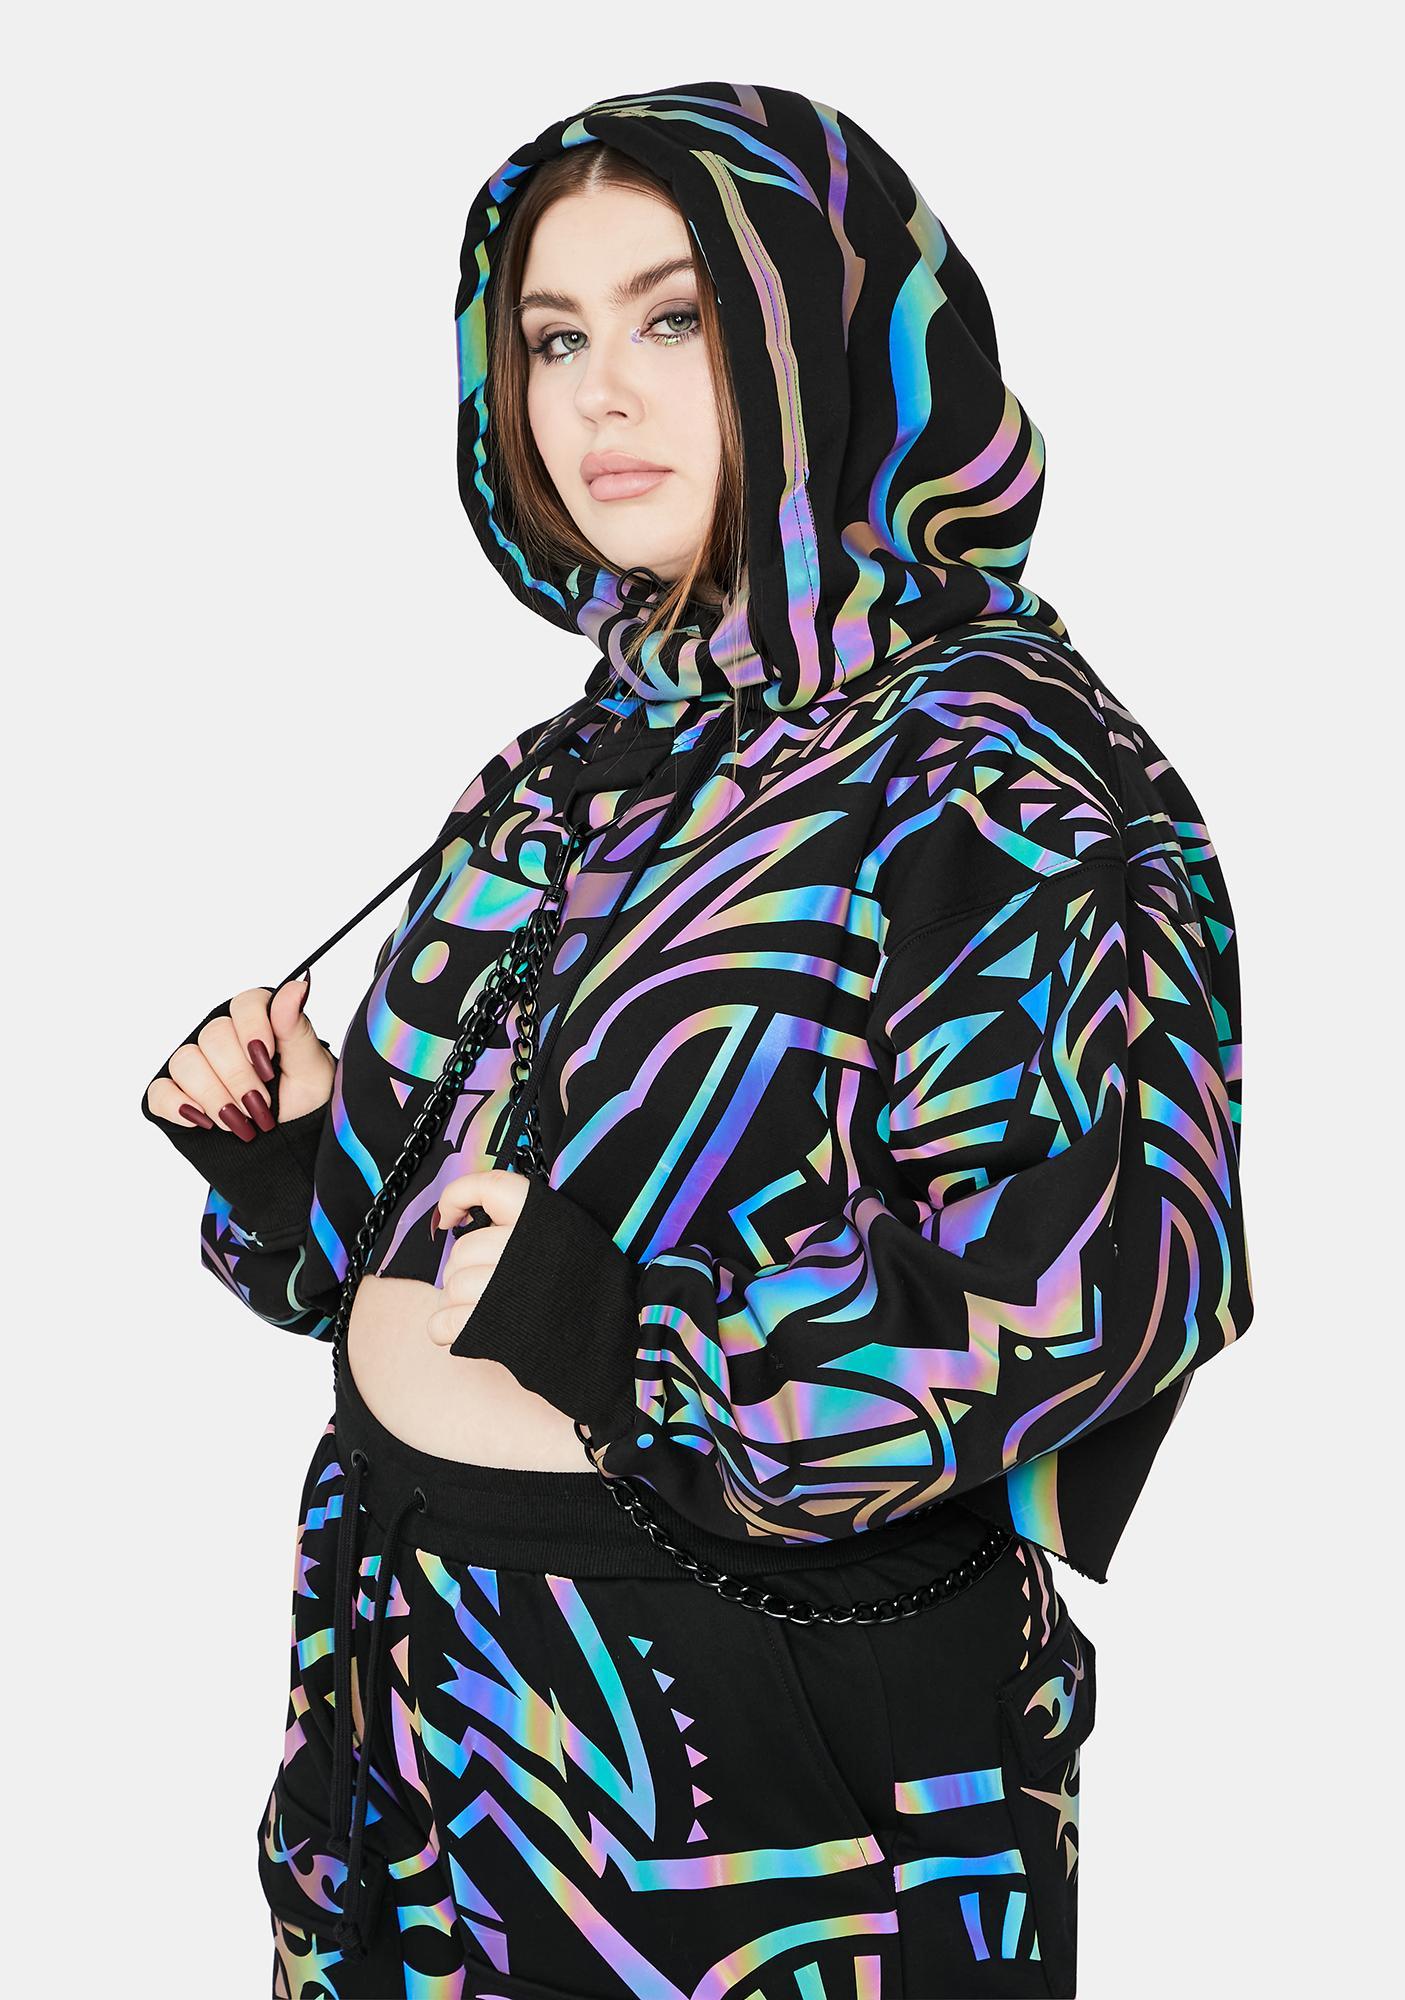 Club Exx Divine Moon Labyrinth Reflective Chain Hoodie